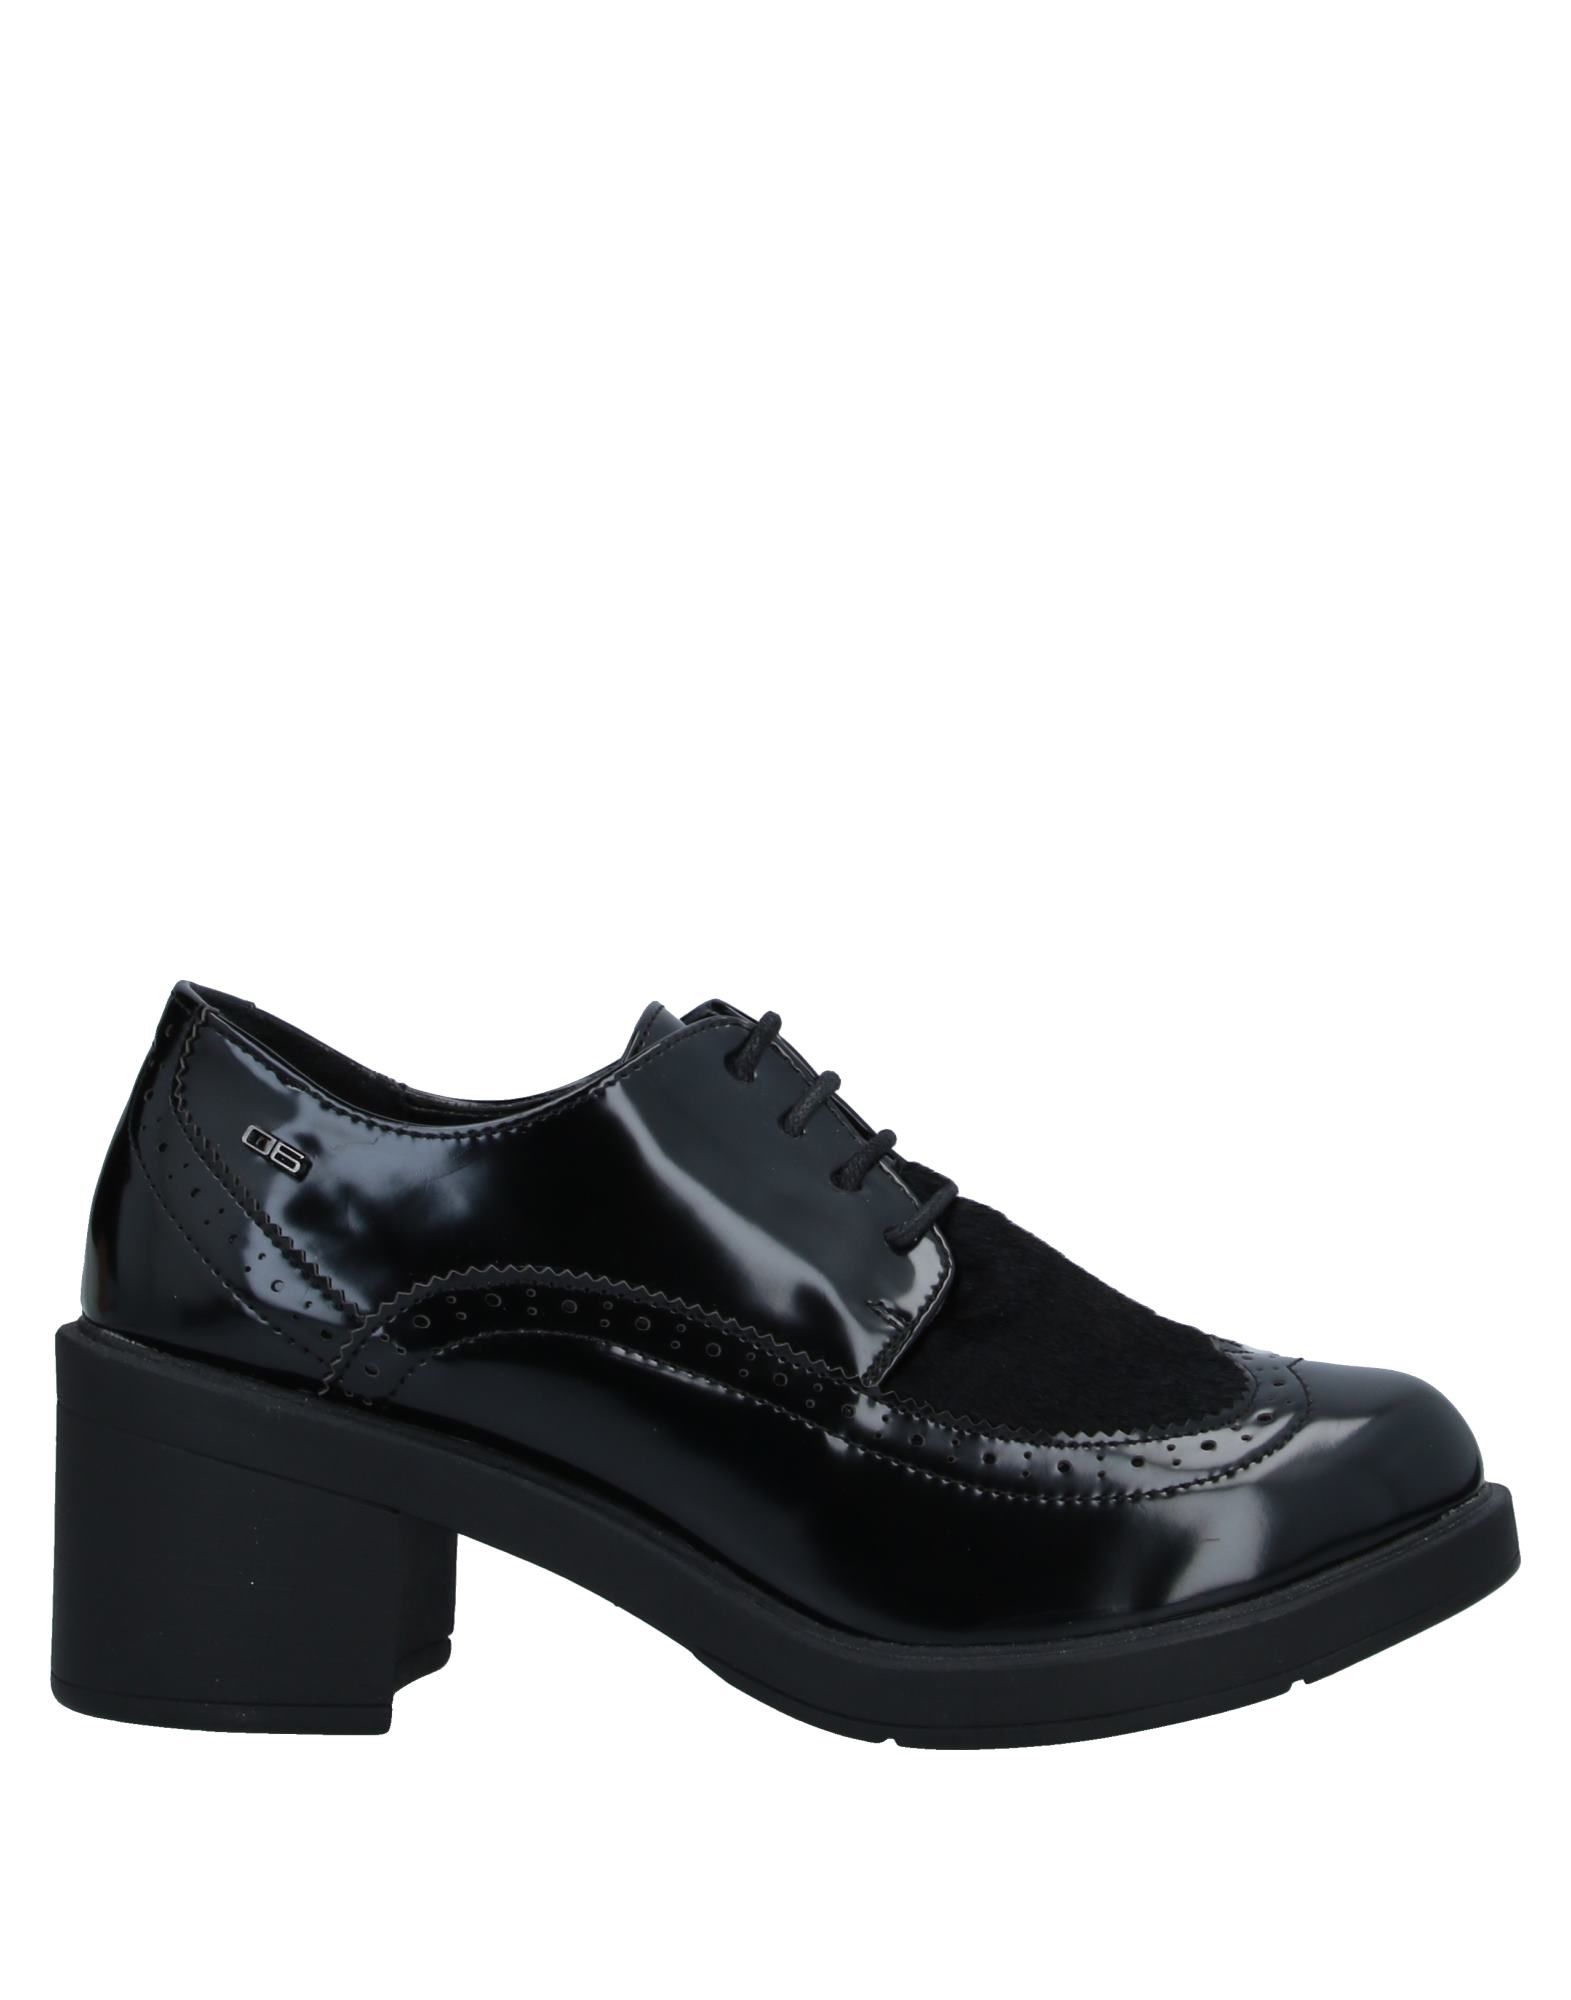 Фото - O6 Milano Обувь на шнурках переходник optimate o6